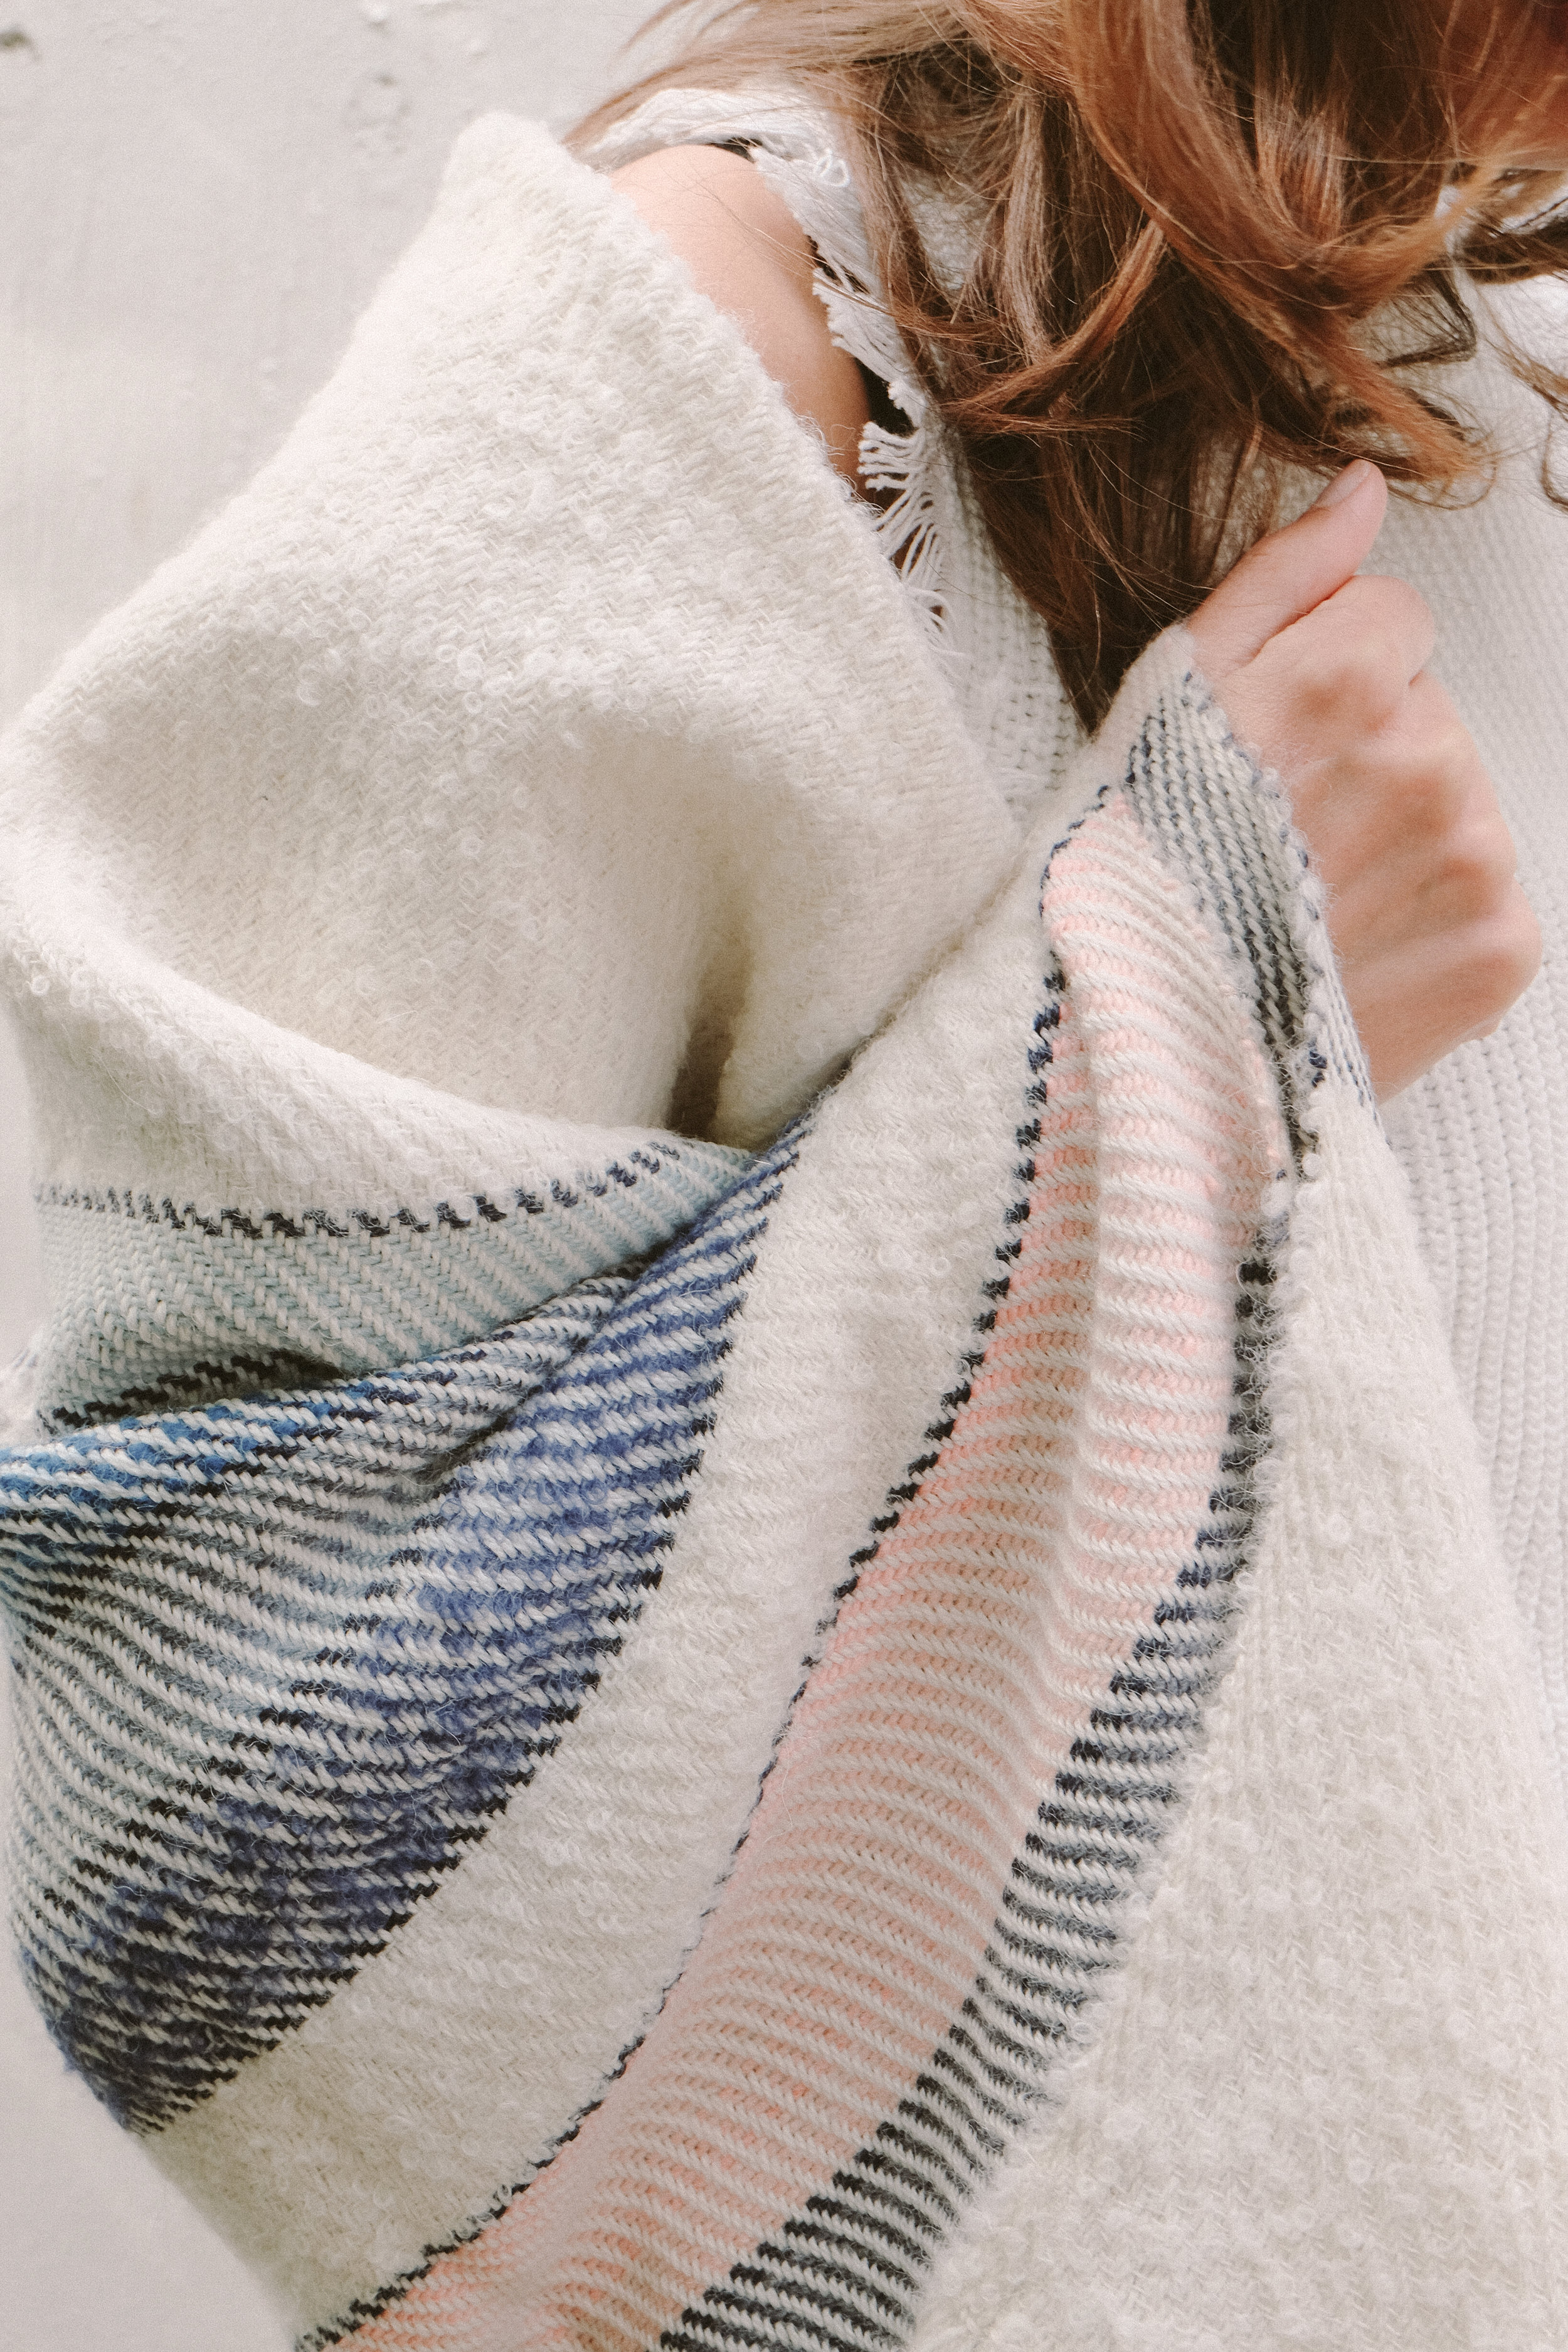 Leah wears: Alima throw/wrap | hand woven in Peru |  SHOP HERE